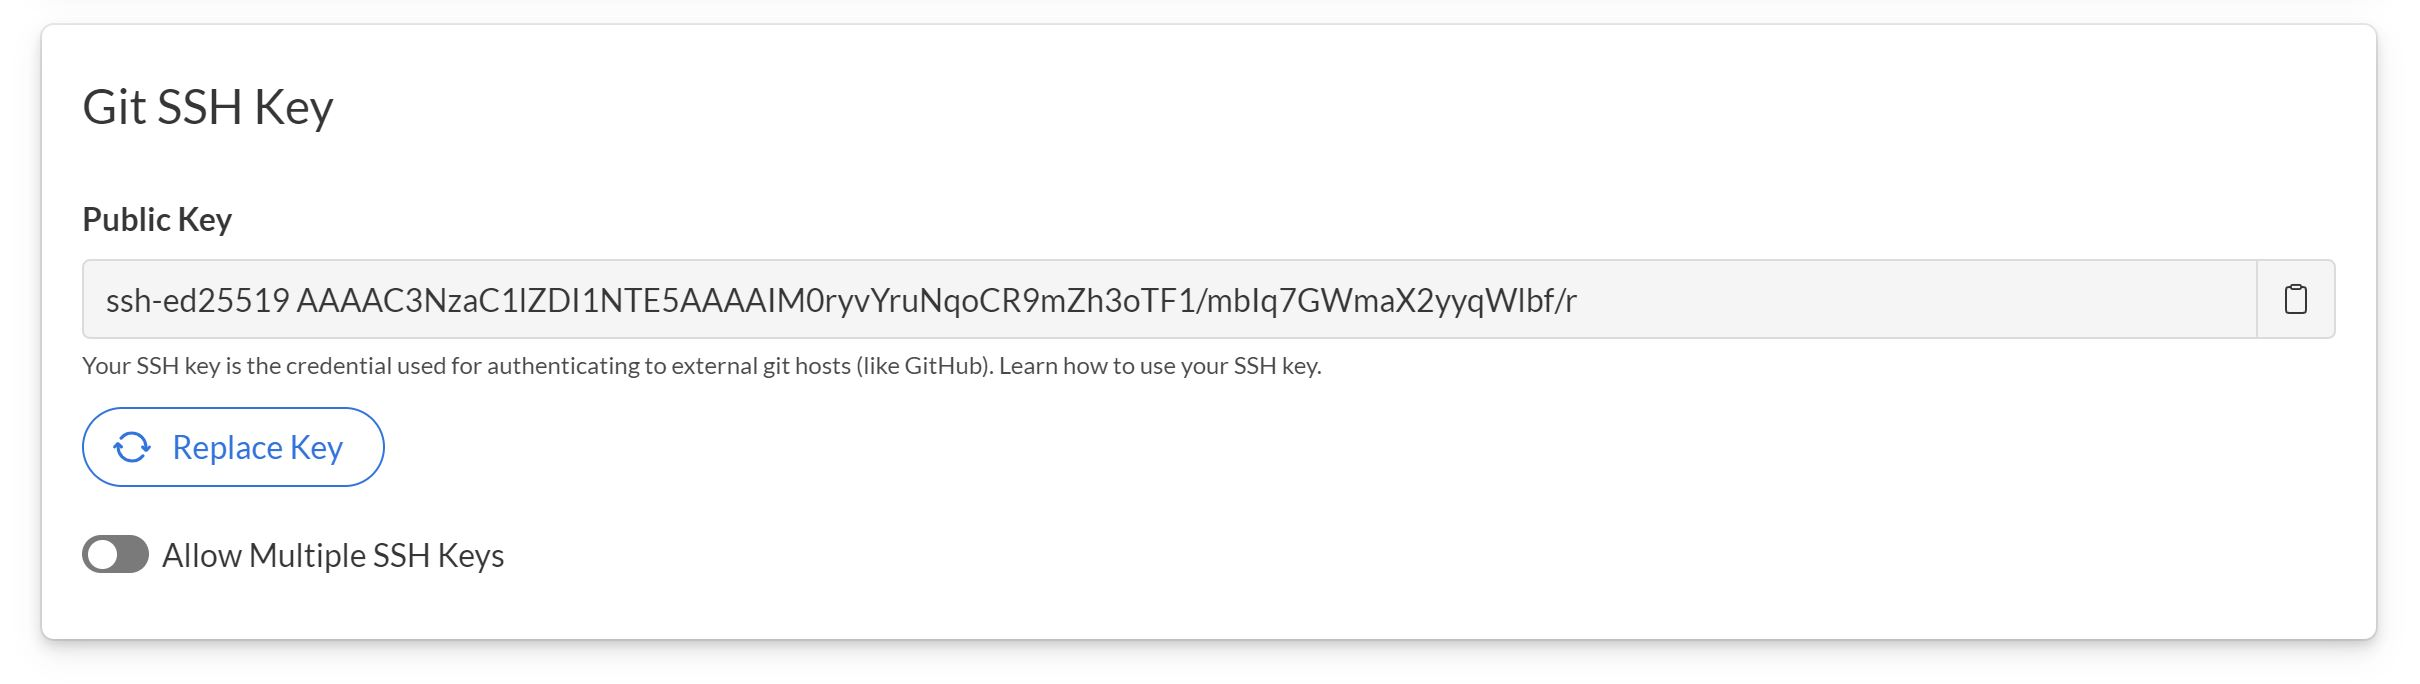 Git SSH key UI